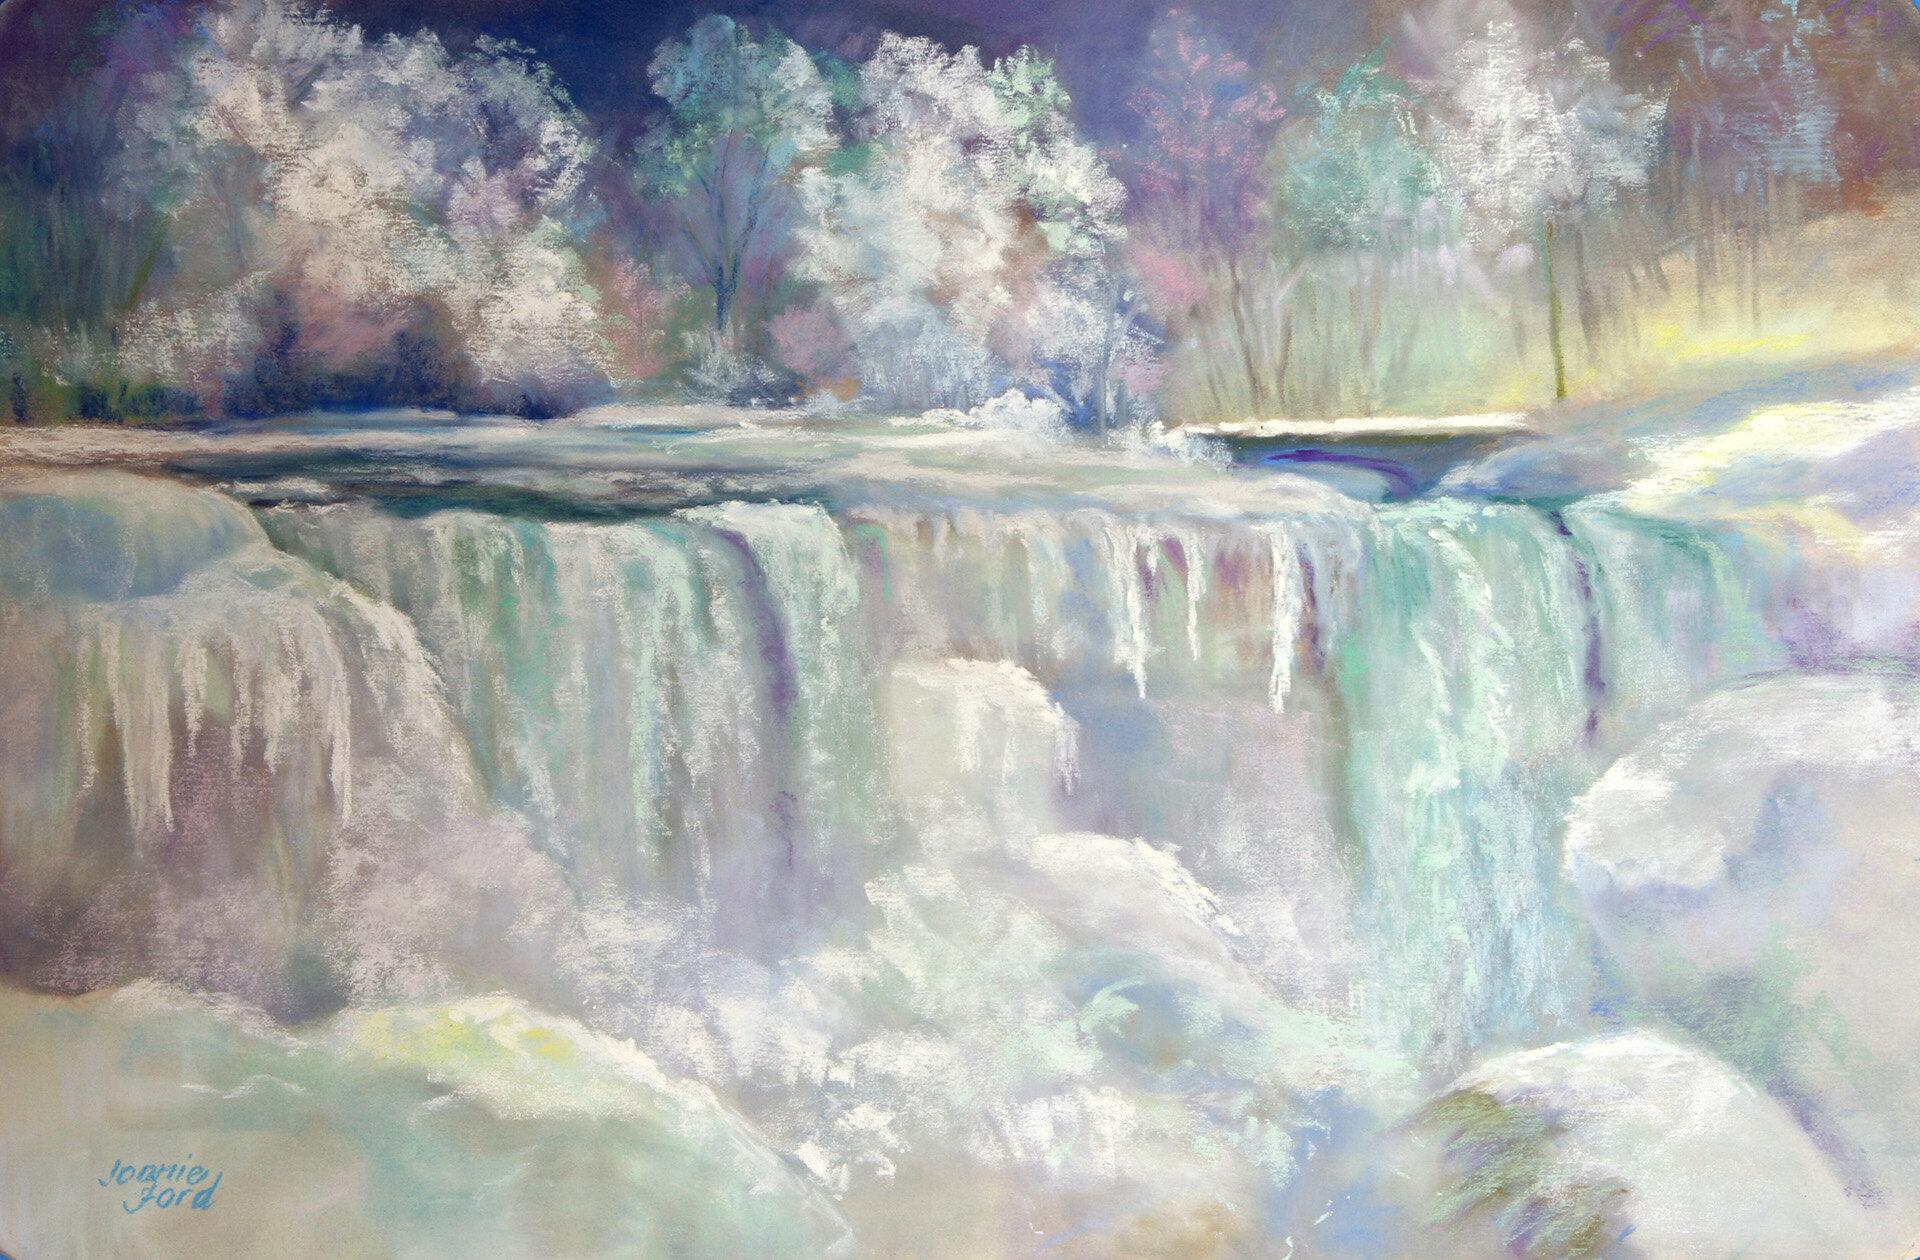 Ford Joanie - Frozen Niagara Falls